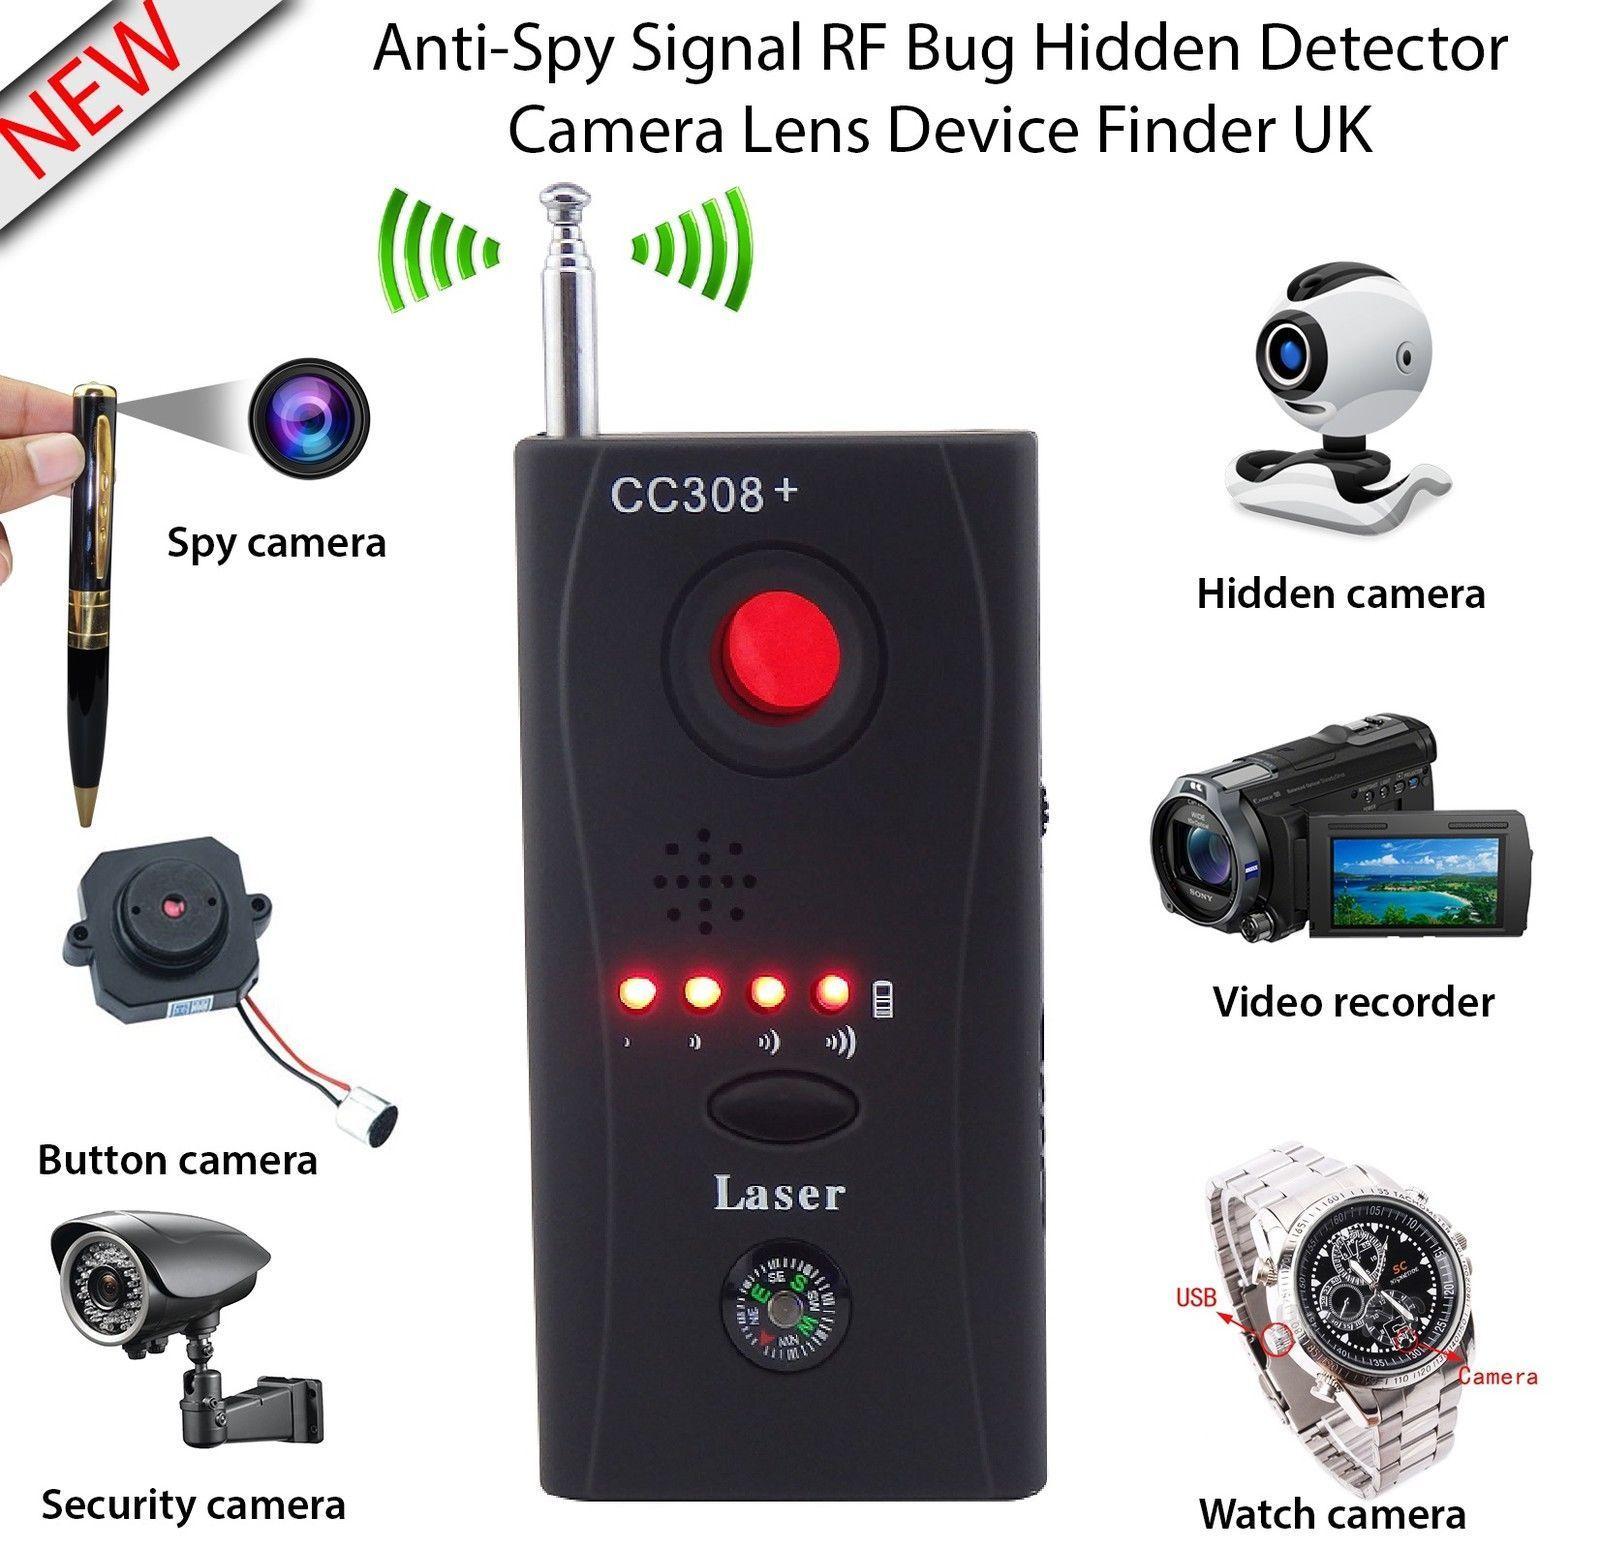 Anti Spy Detector Camera GSM Audio Bug Finder Wireless GPS Signal RF Tracker Privacy Protect Security US Plug